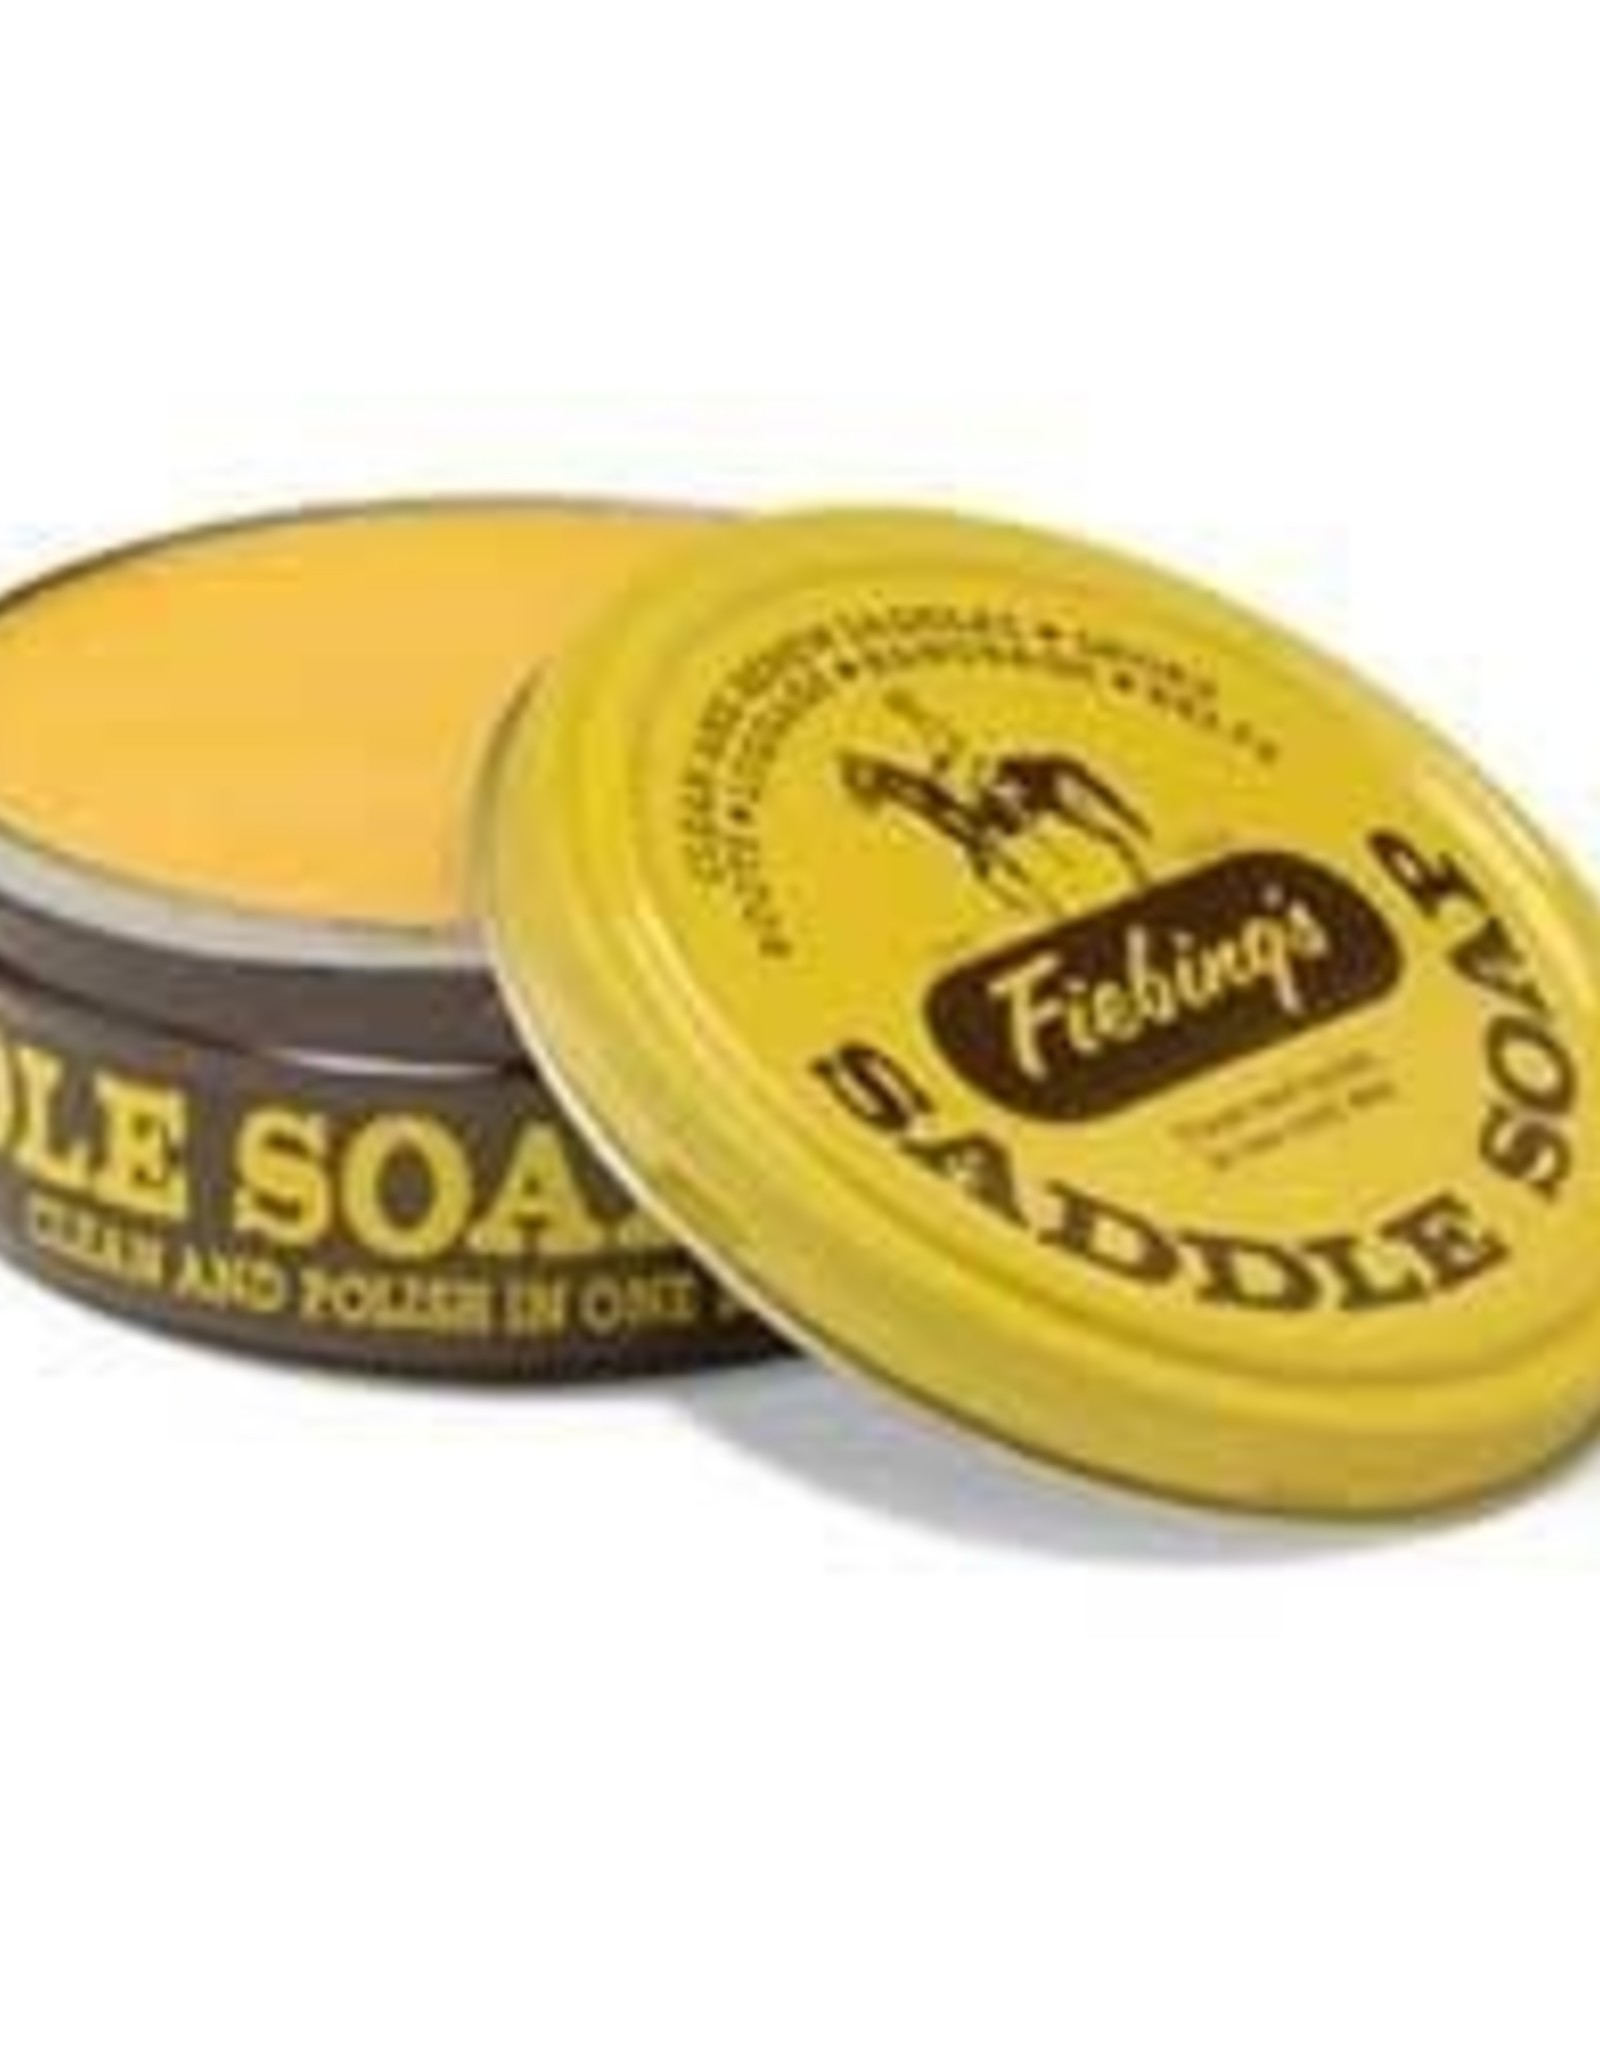 Fiebing's Saddle Soap Yellow - 3oz